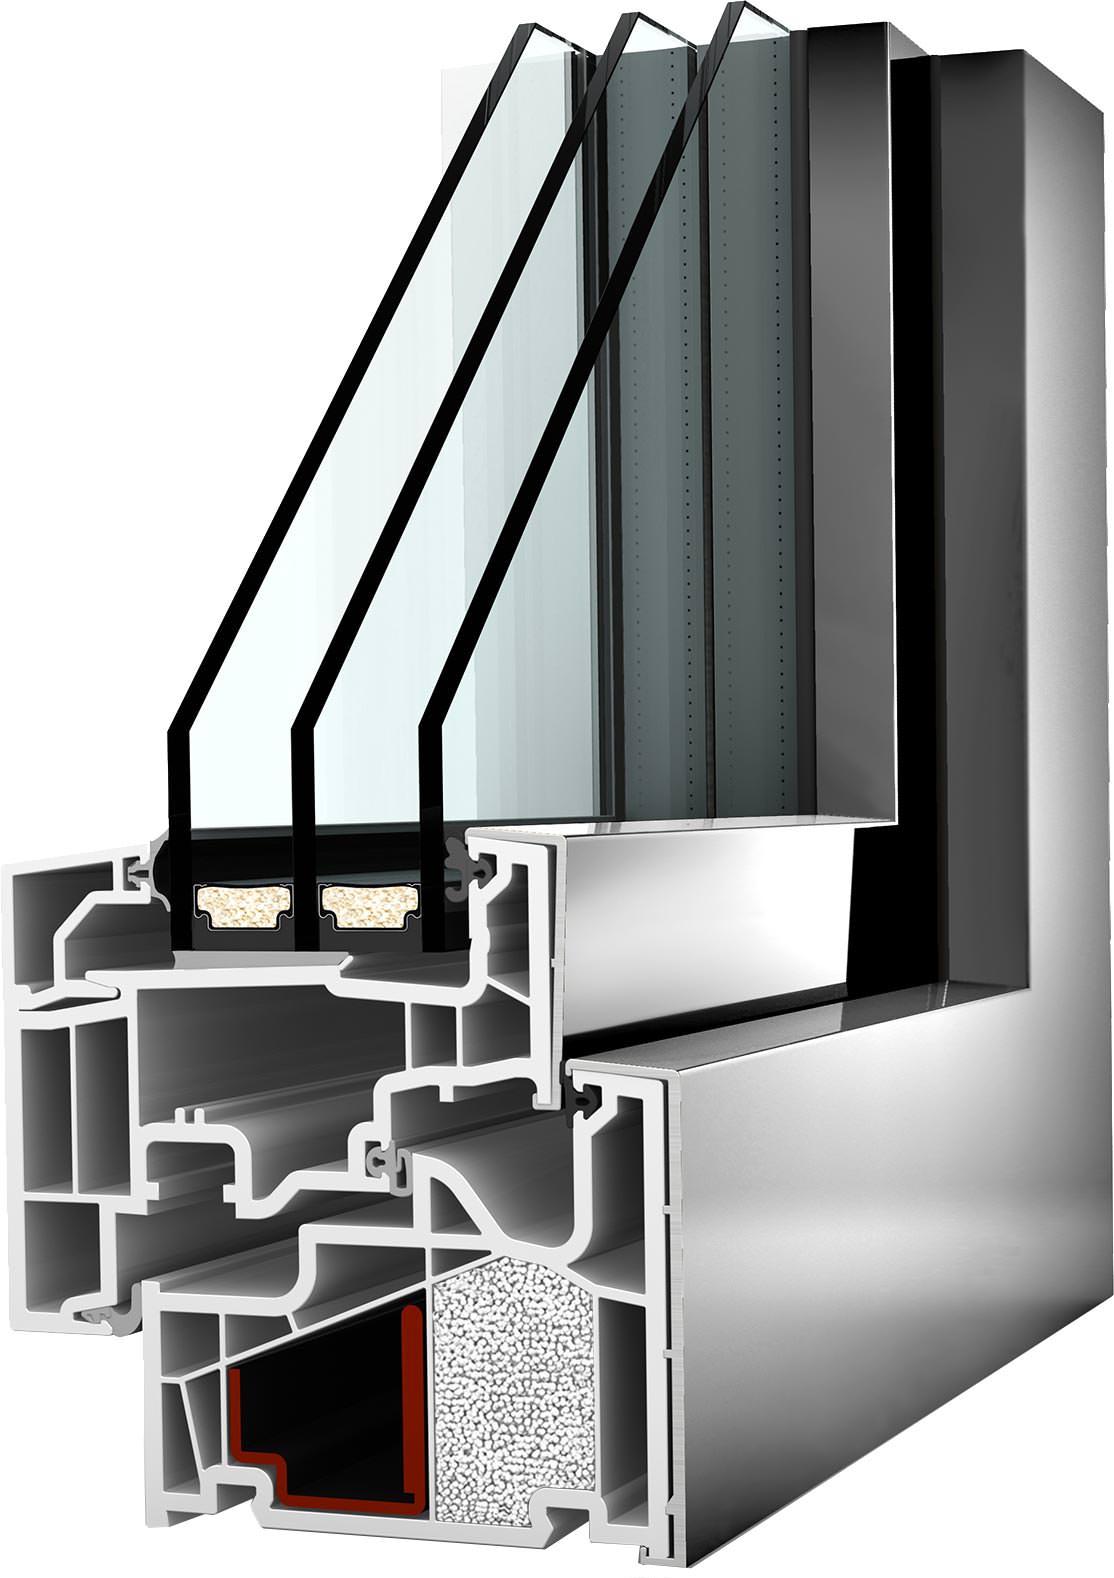 Granulat statt schaum internorm optimiert d mmung bei for Fenster internorm